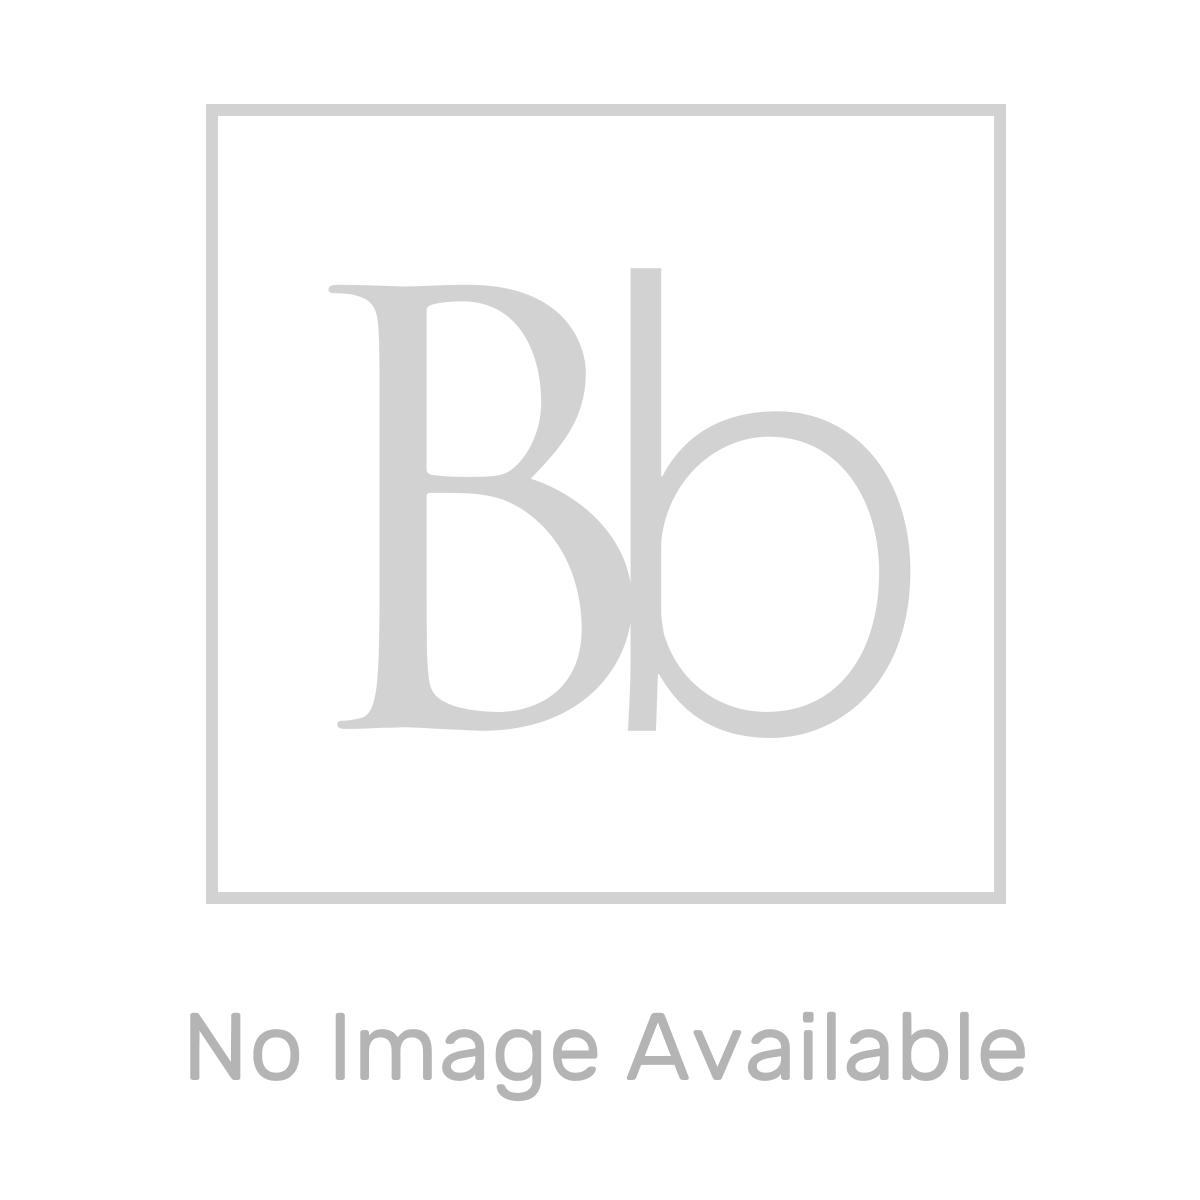 RAK Obelisk Ecofix Black Cistern Cabinet for Wall Hung Pans Measurements